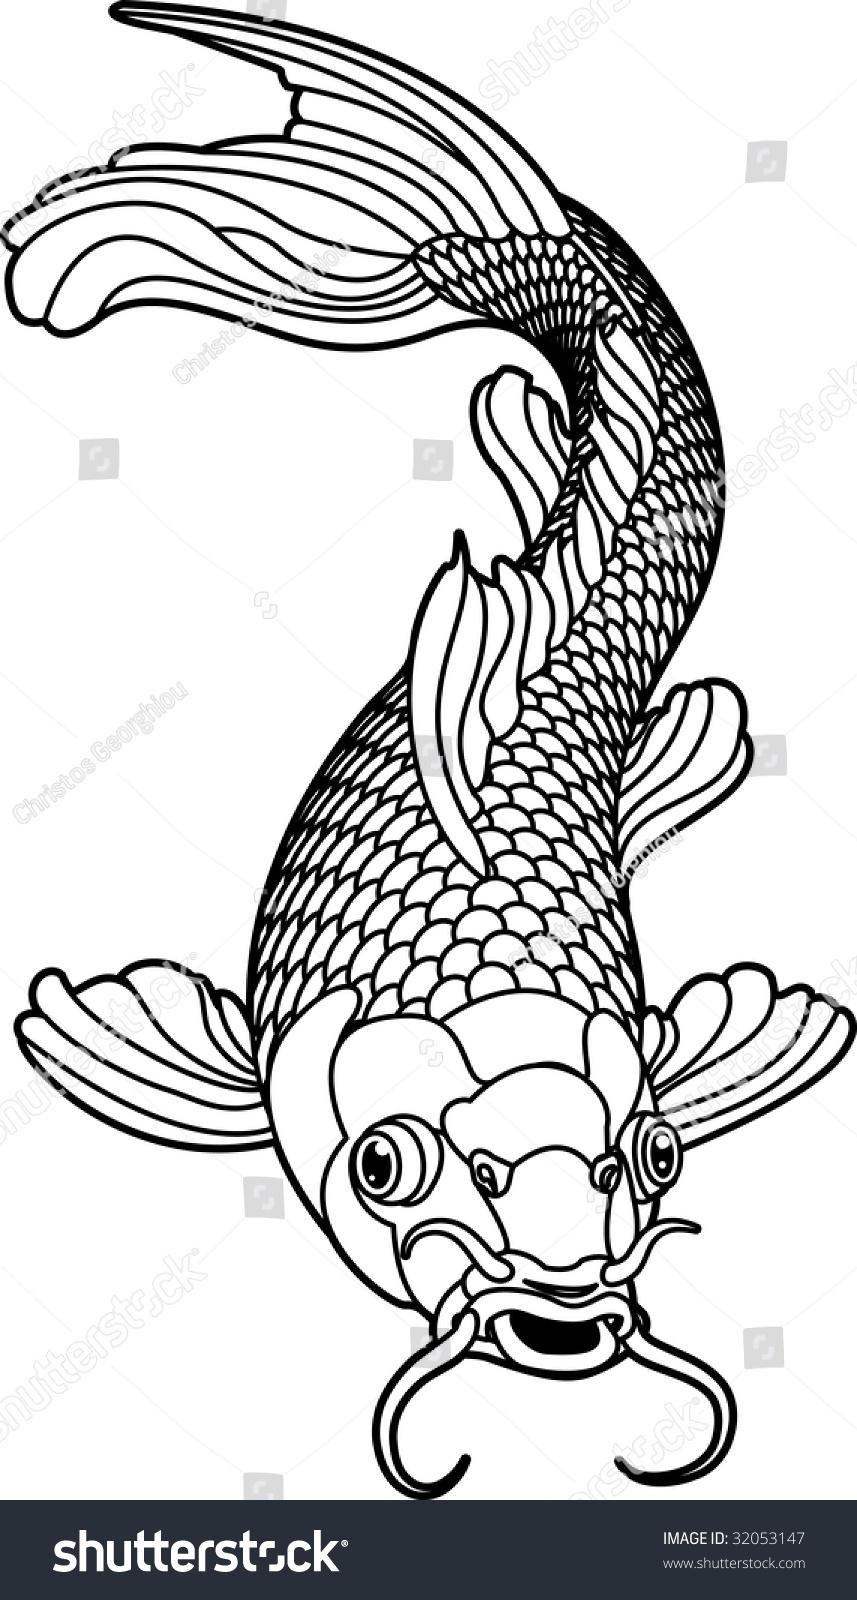 Beautiful Koi Carp Fish Illustration Monochrome Stock Illustration